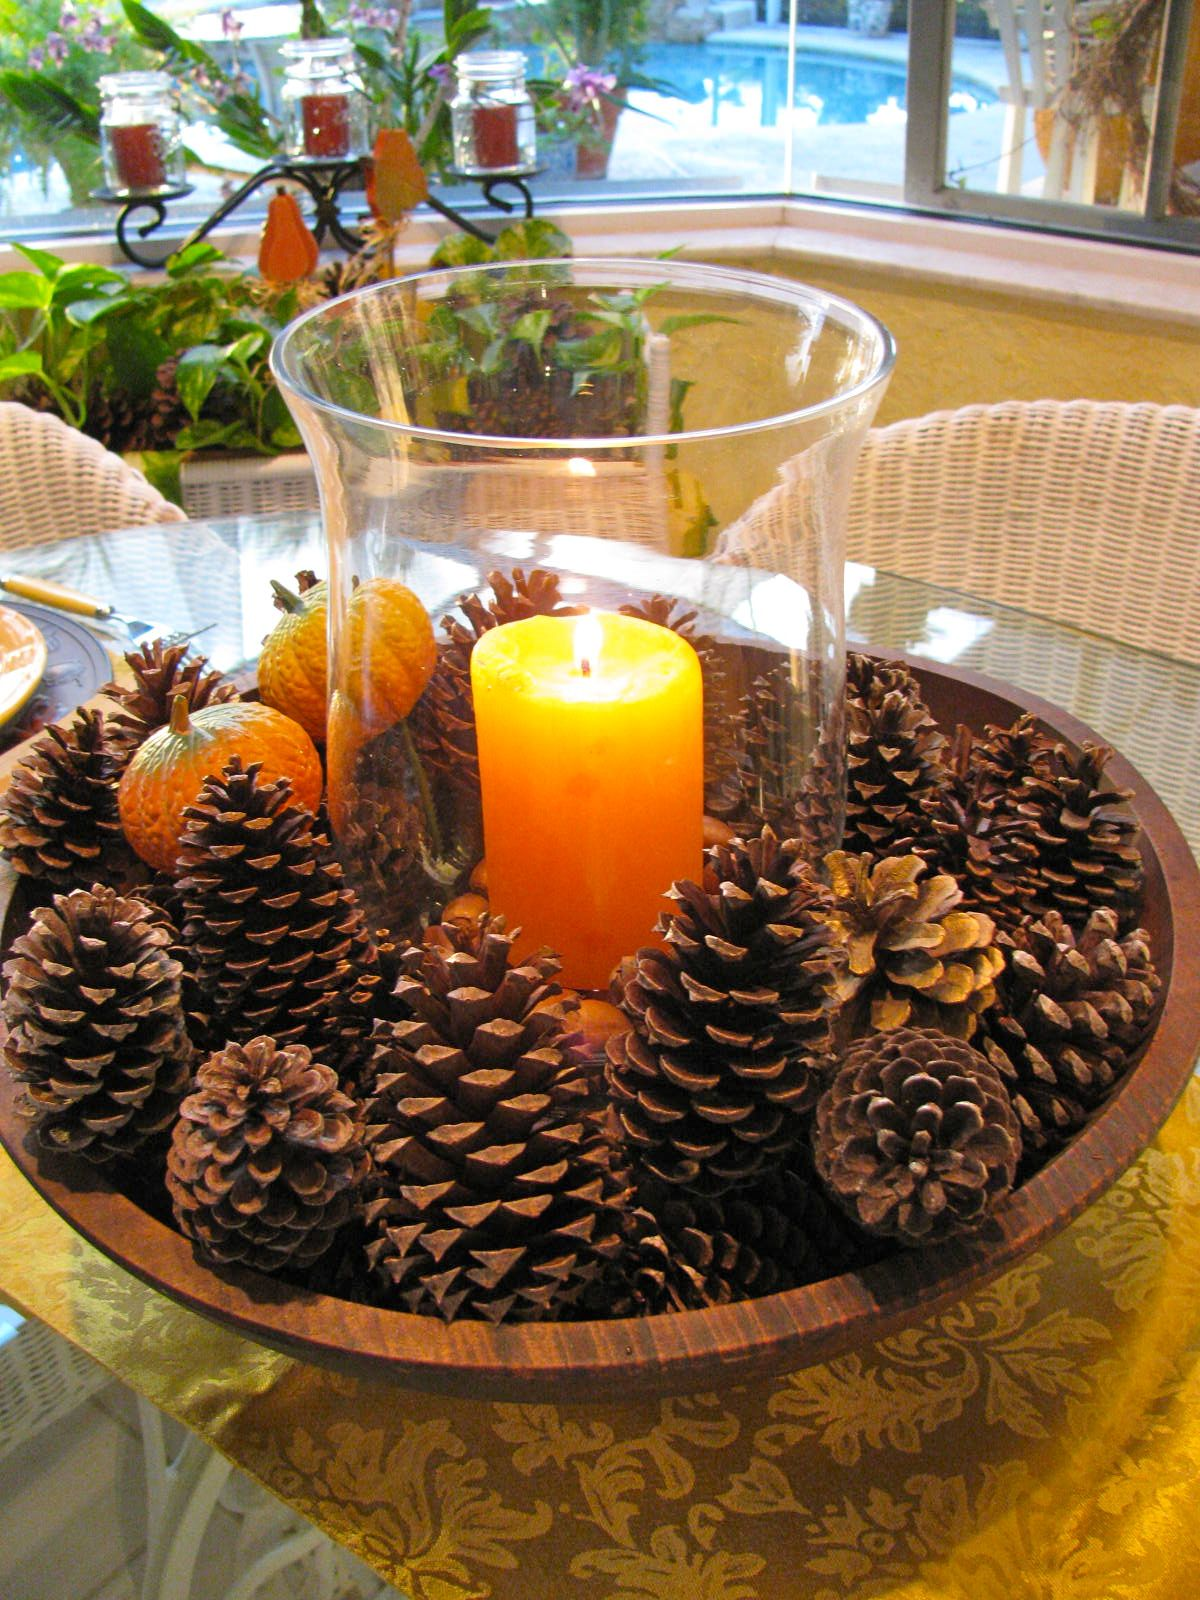 27 diy fall centerpiece ideas to pumpkin spice up your decor